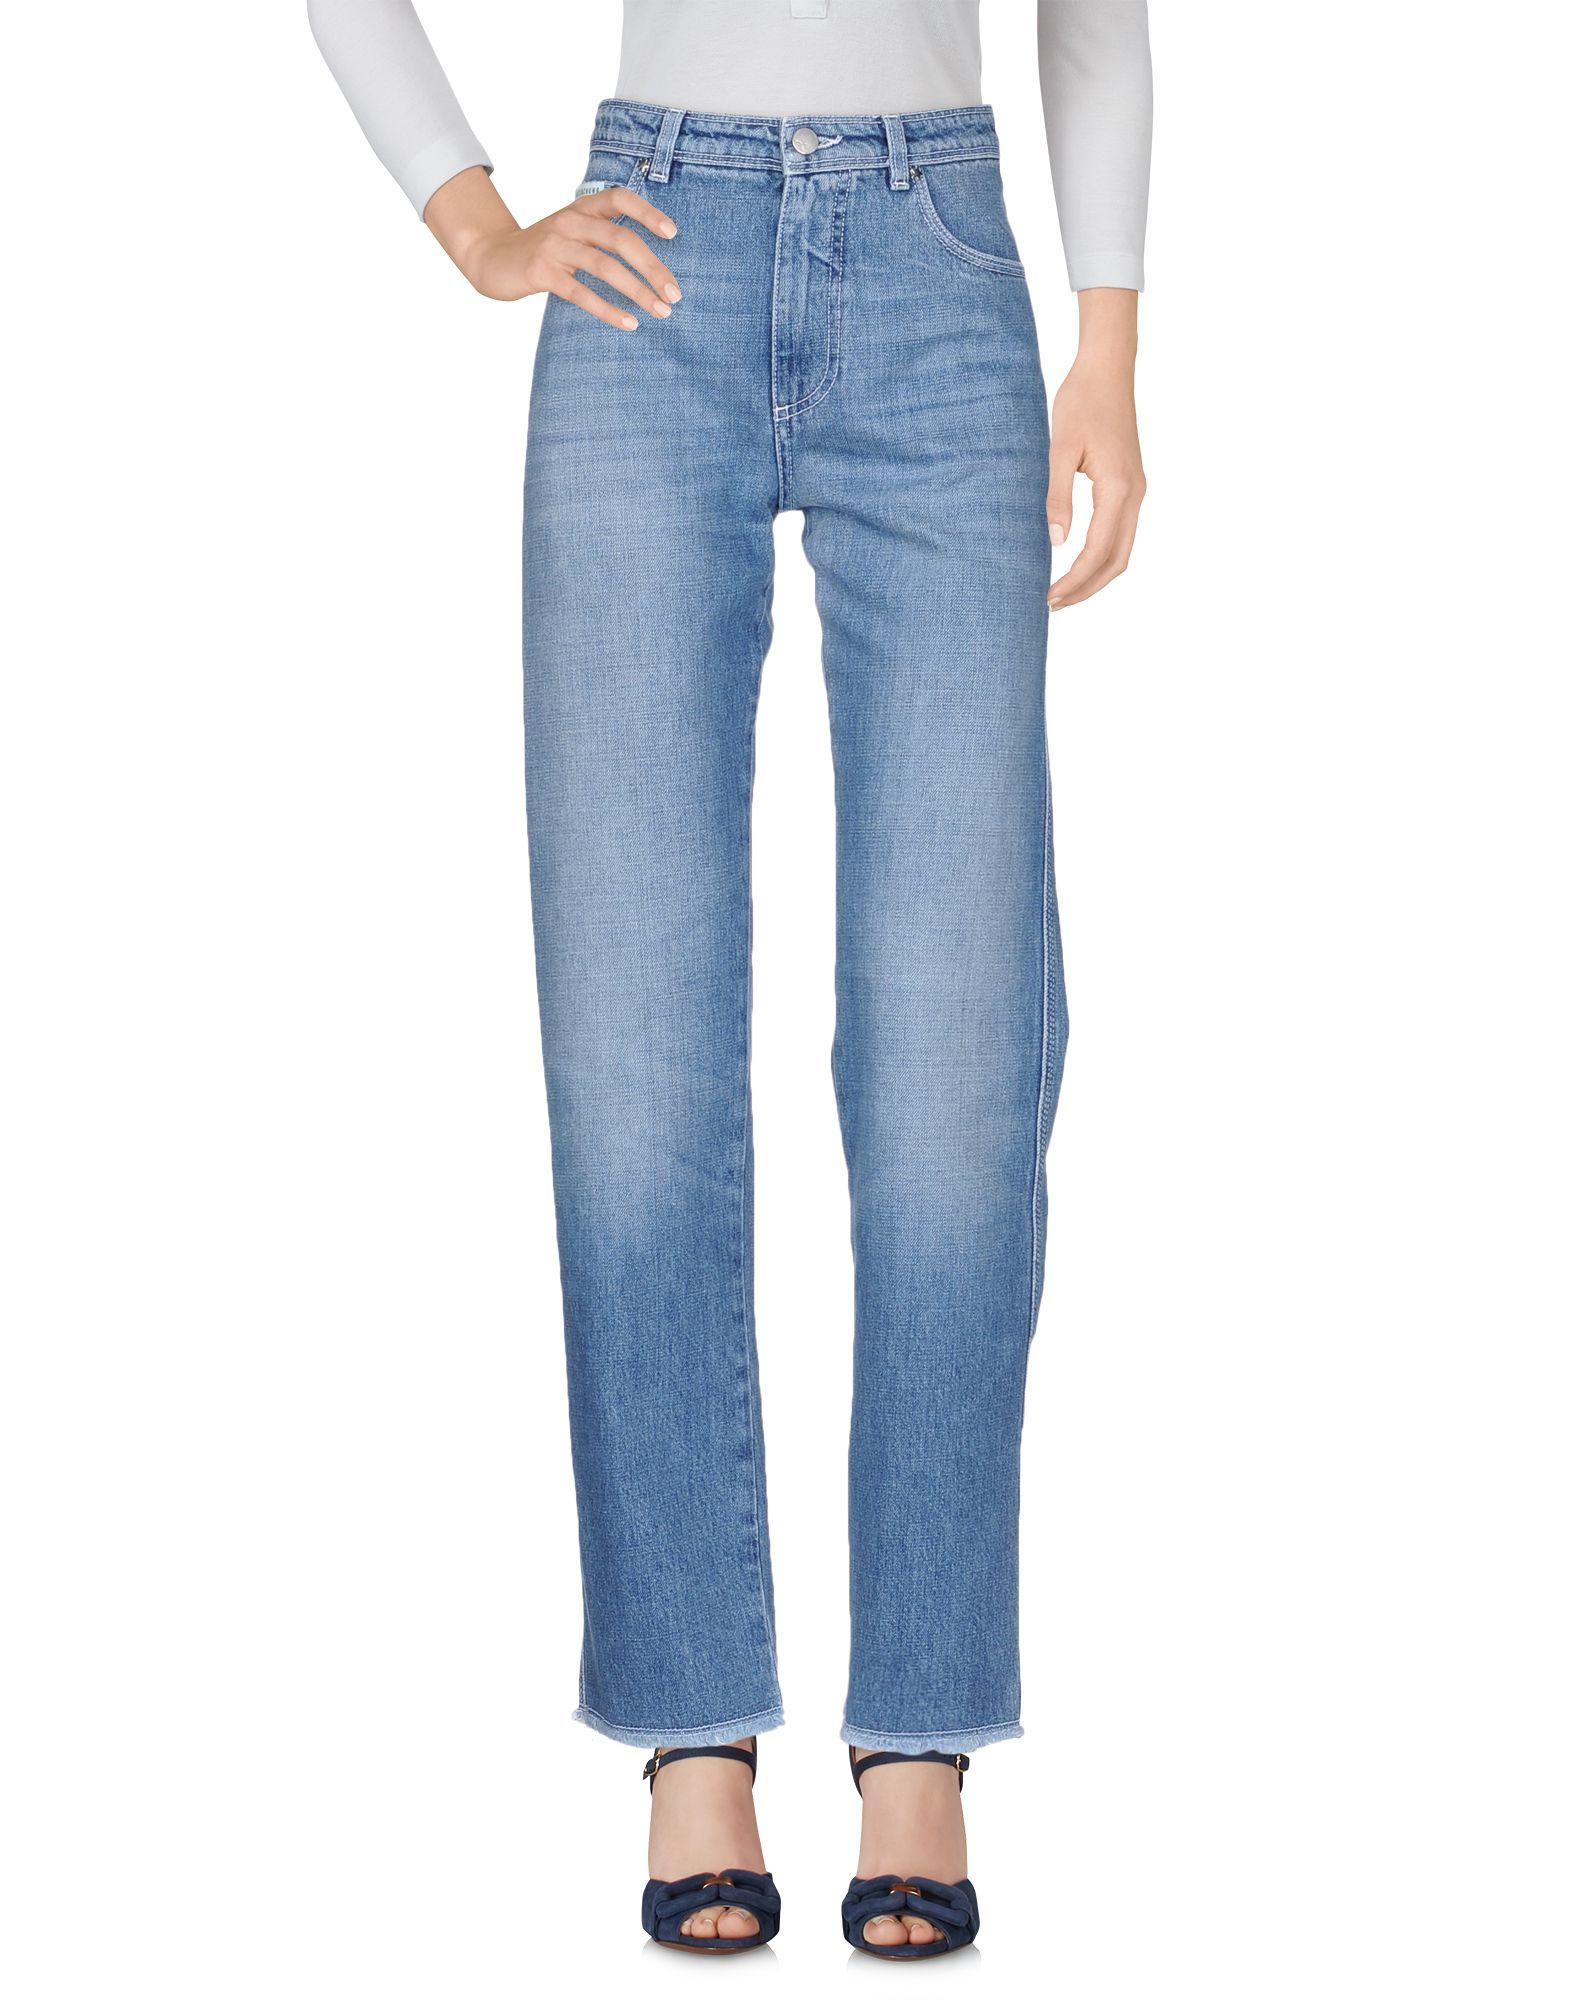 ALEXA CHUNG for AG Jeans Джинсовые брюки